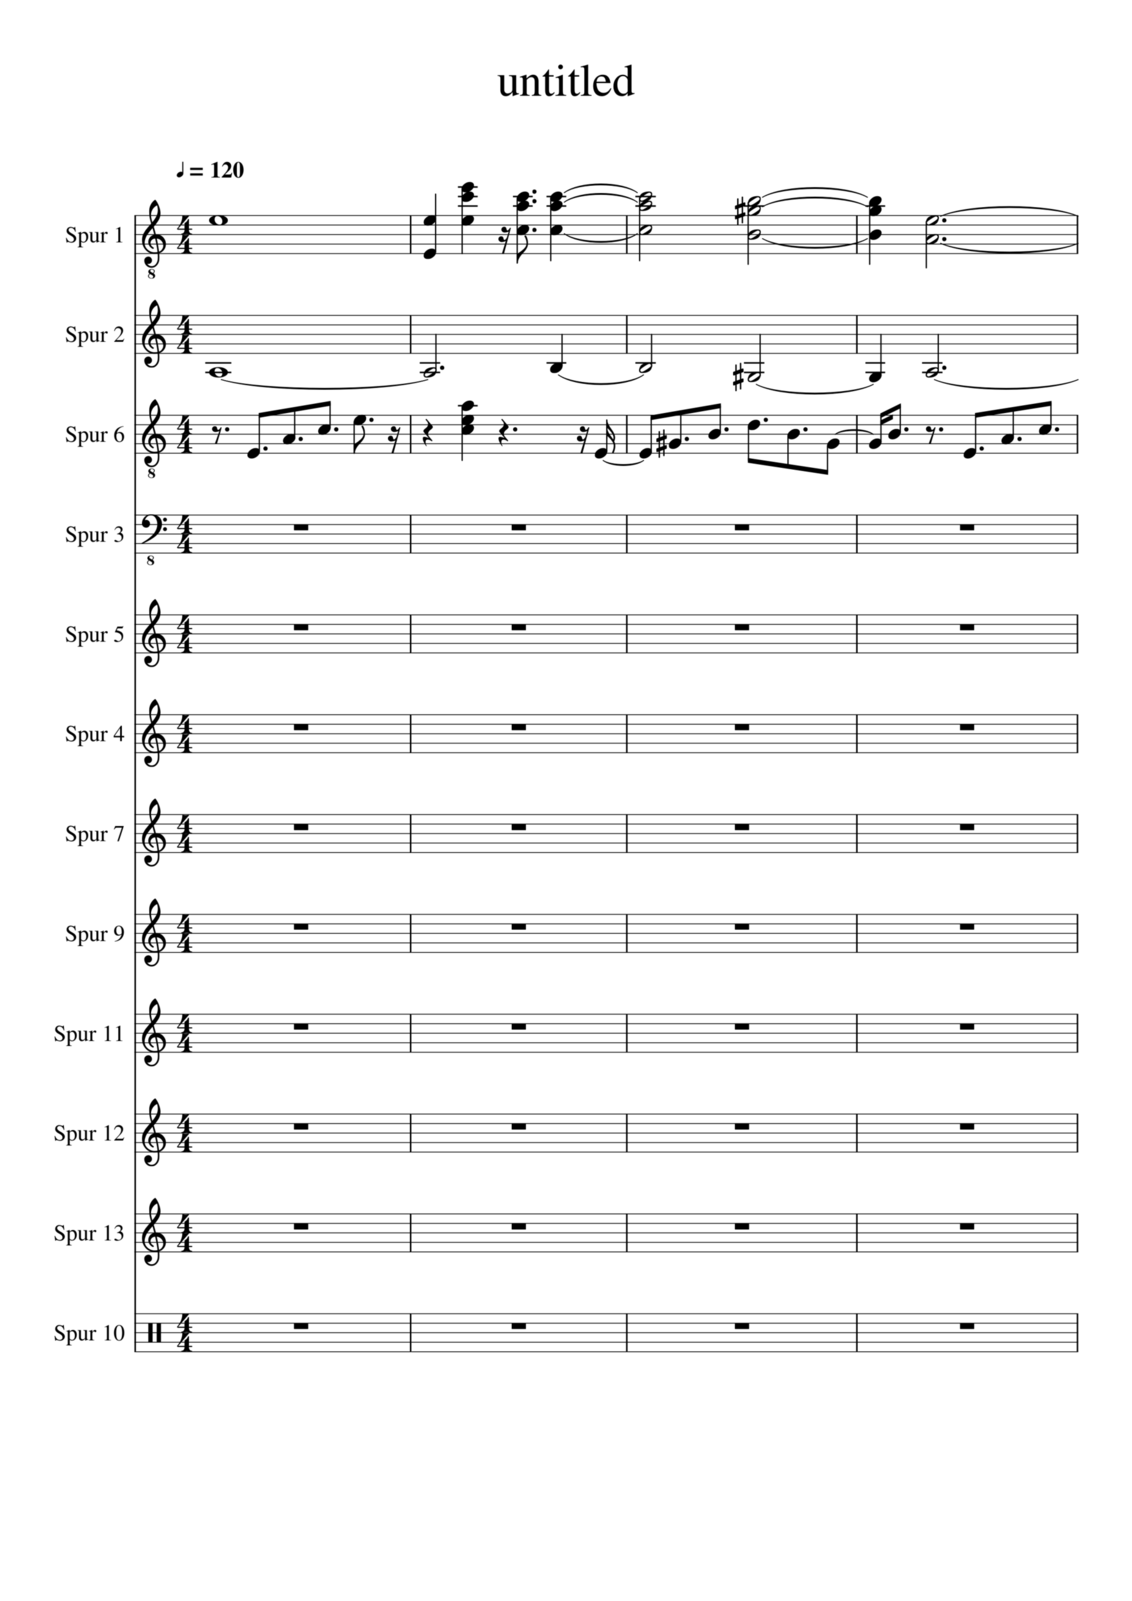 Prosti slide, Image 1